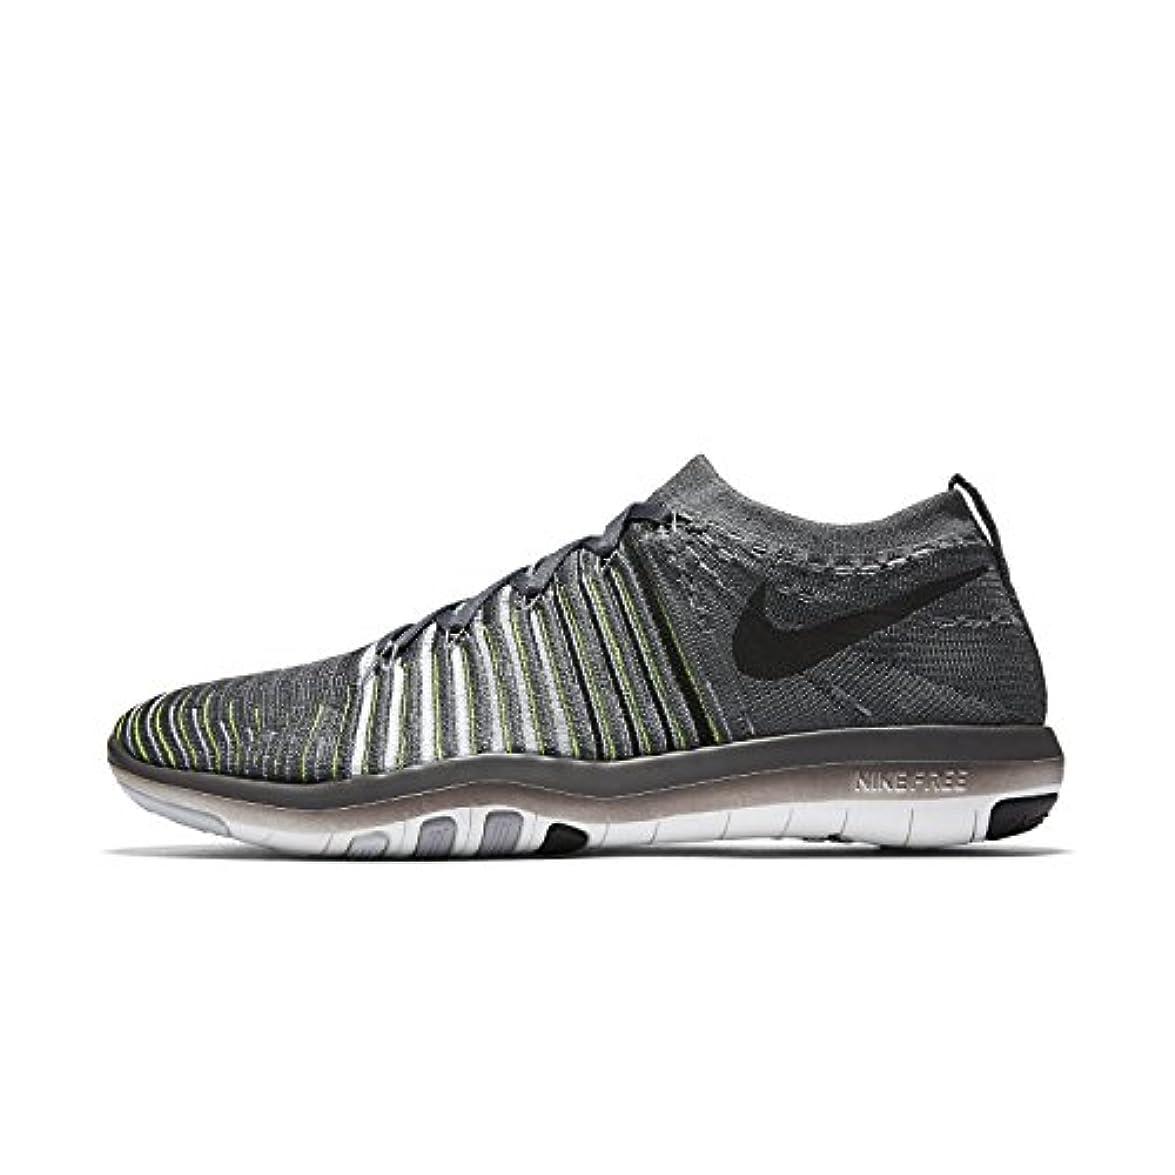 Nike Wm Free Transform Flyknit Scarpe Da Ginnastica Donna